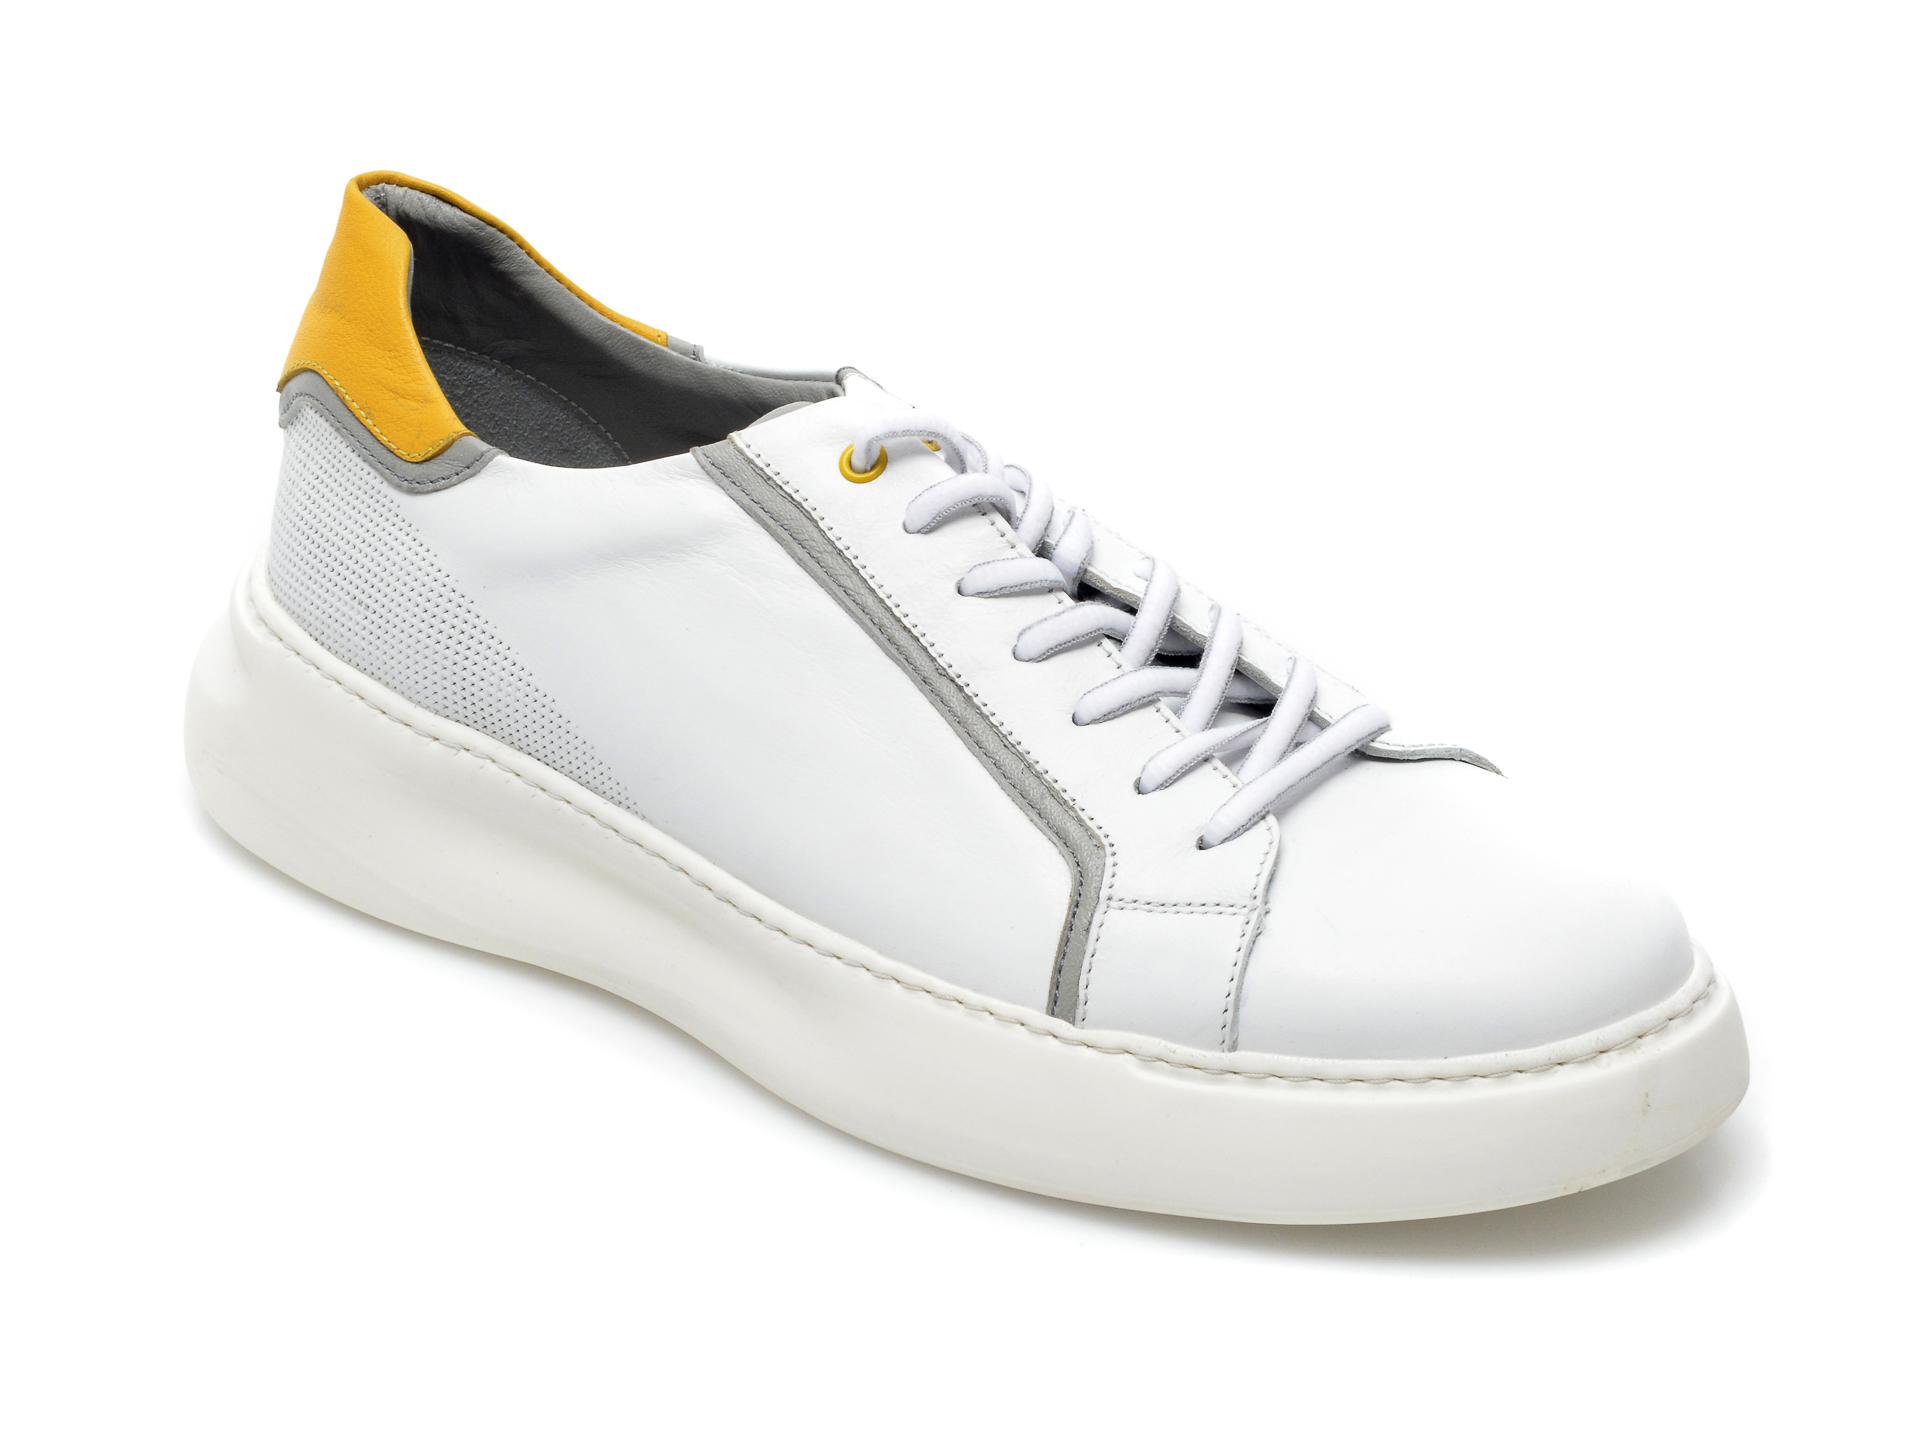 Pantofi OTTER albi, 25503, din piele naturala imagine